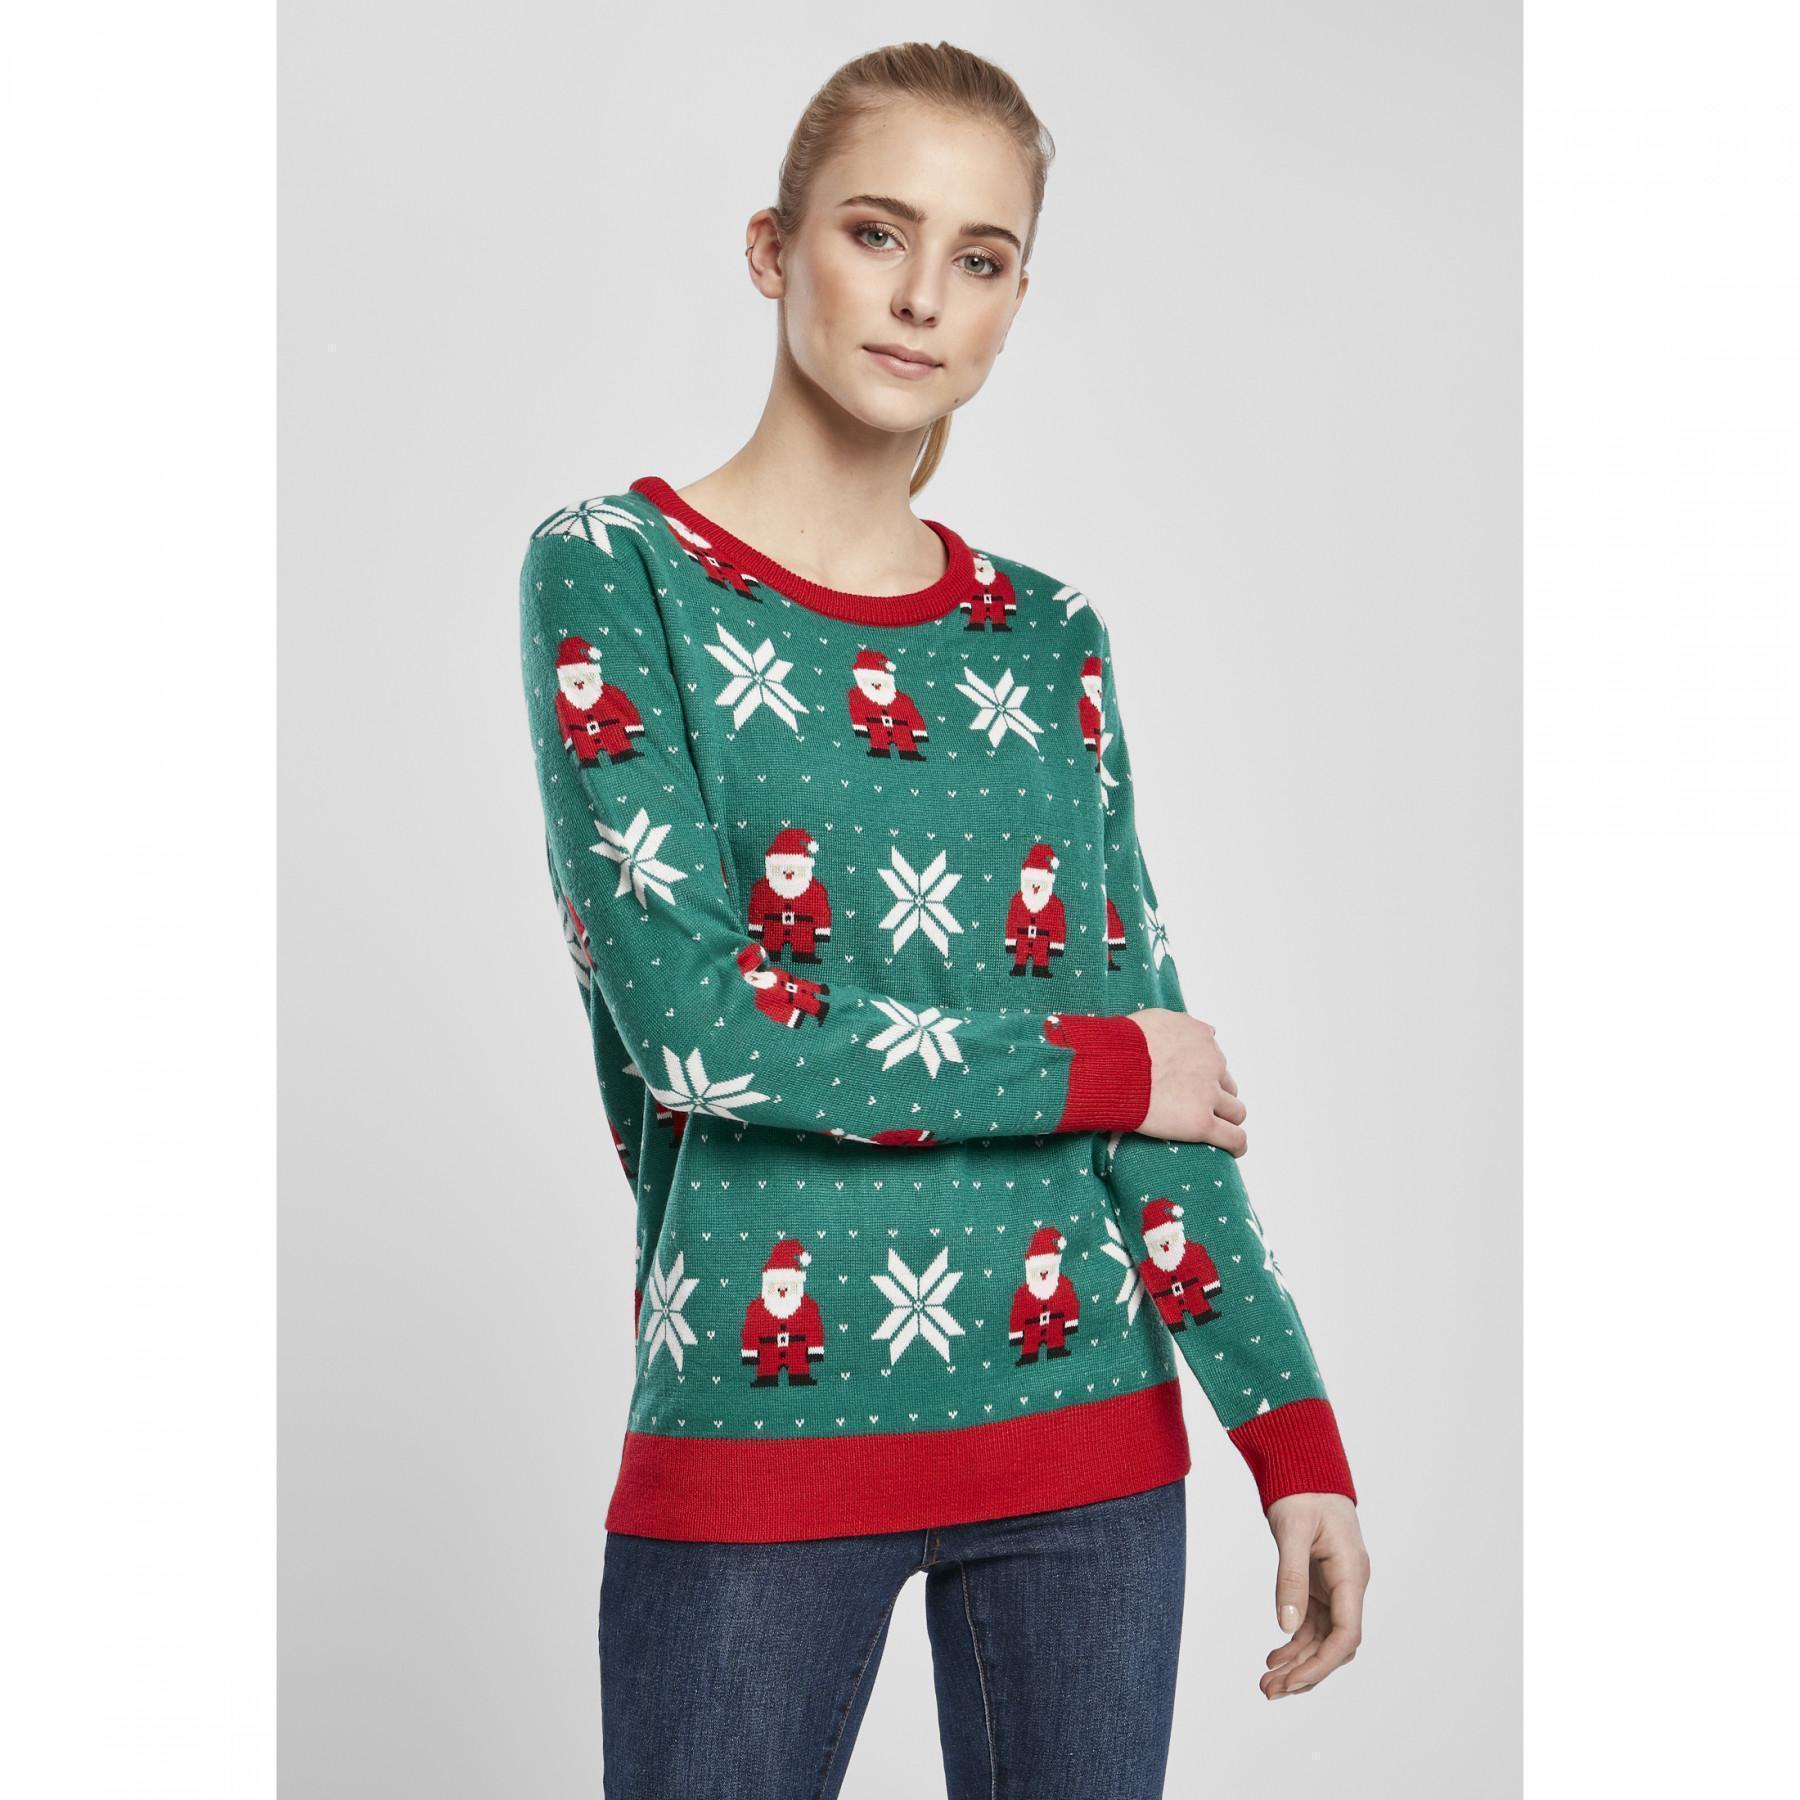 Sweatshirt woman Urban Classics santa christmas (large sizes)